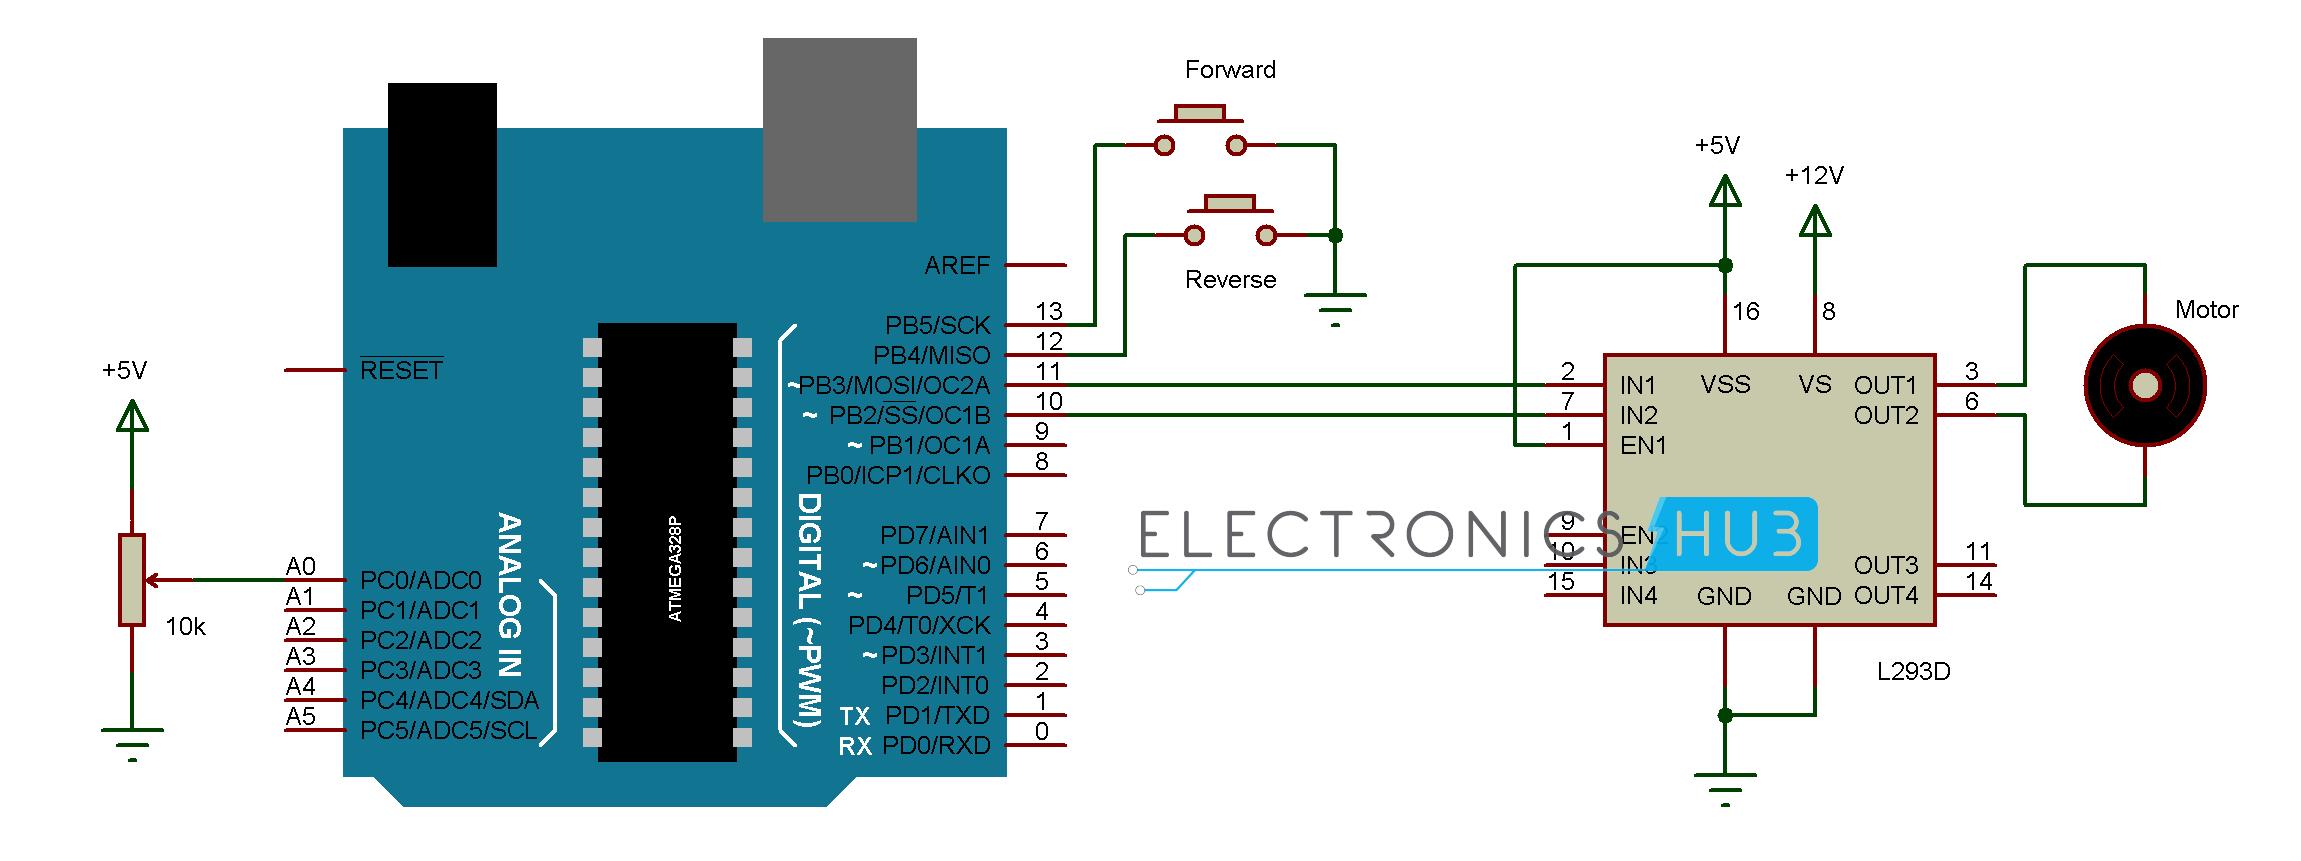 Swell Dc Motor Control With Arduino Wiring Cloud Itislusmarecoveryedborg